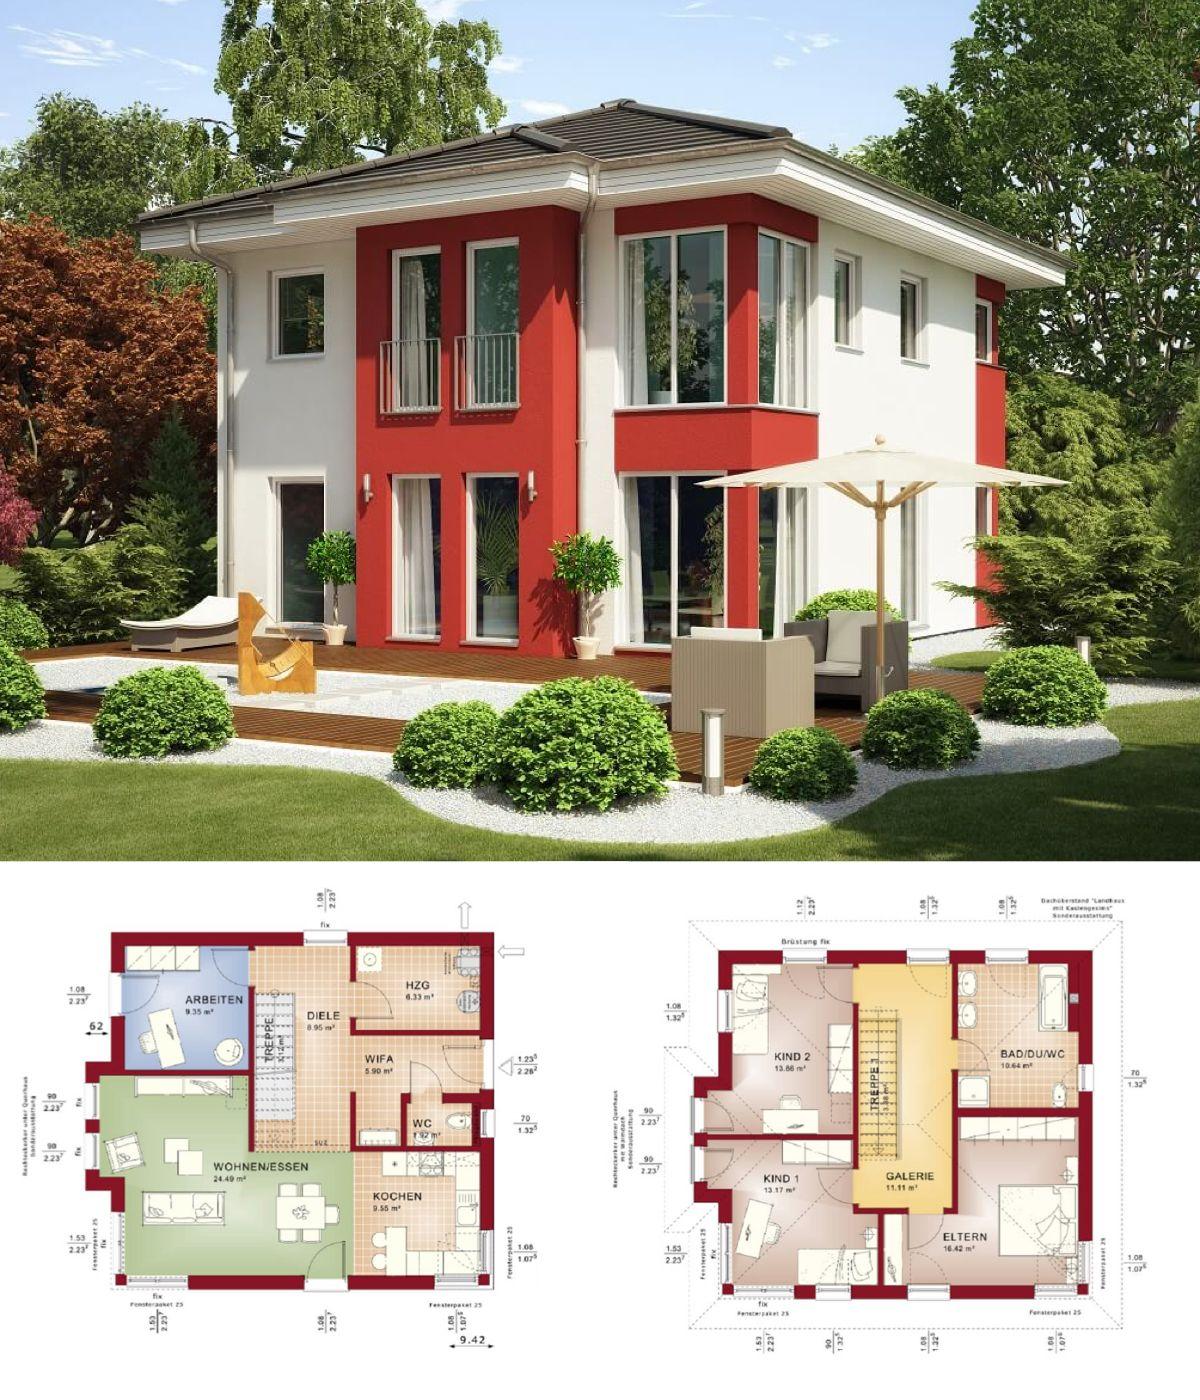 moderne stadtvilla haus evolution 136 v2 bien zenker fertighaus bauen walmdach fassade putz. Black Bedroom Furniture Sets. Home Design Ideas